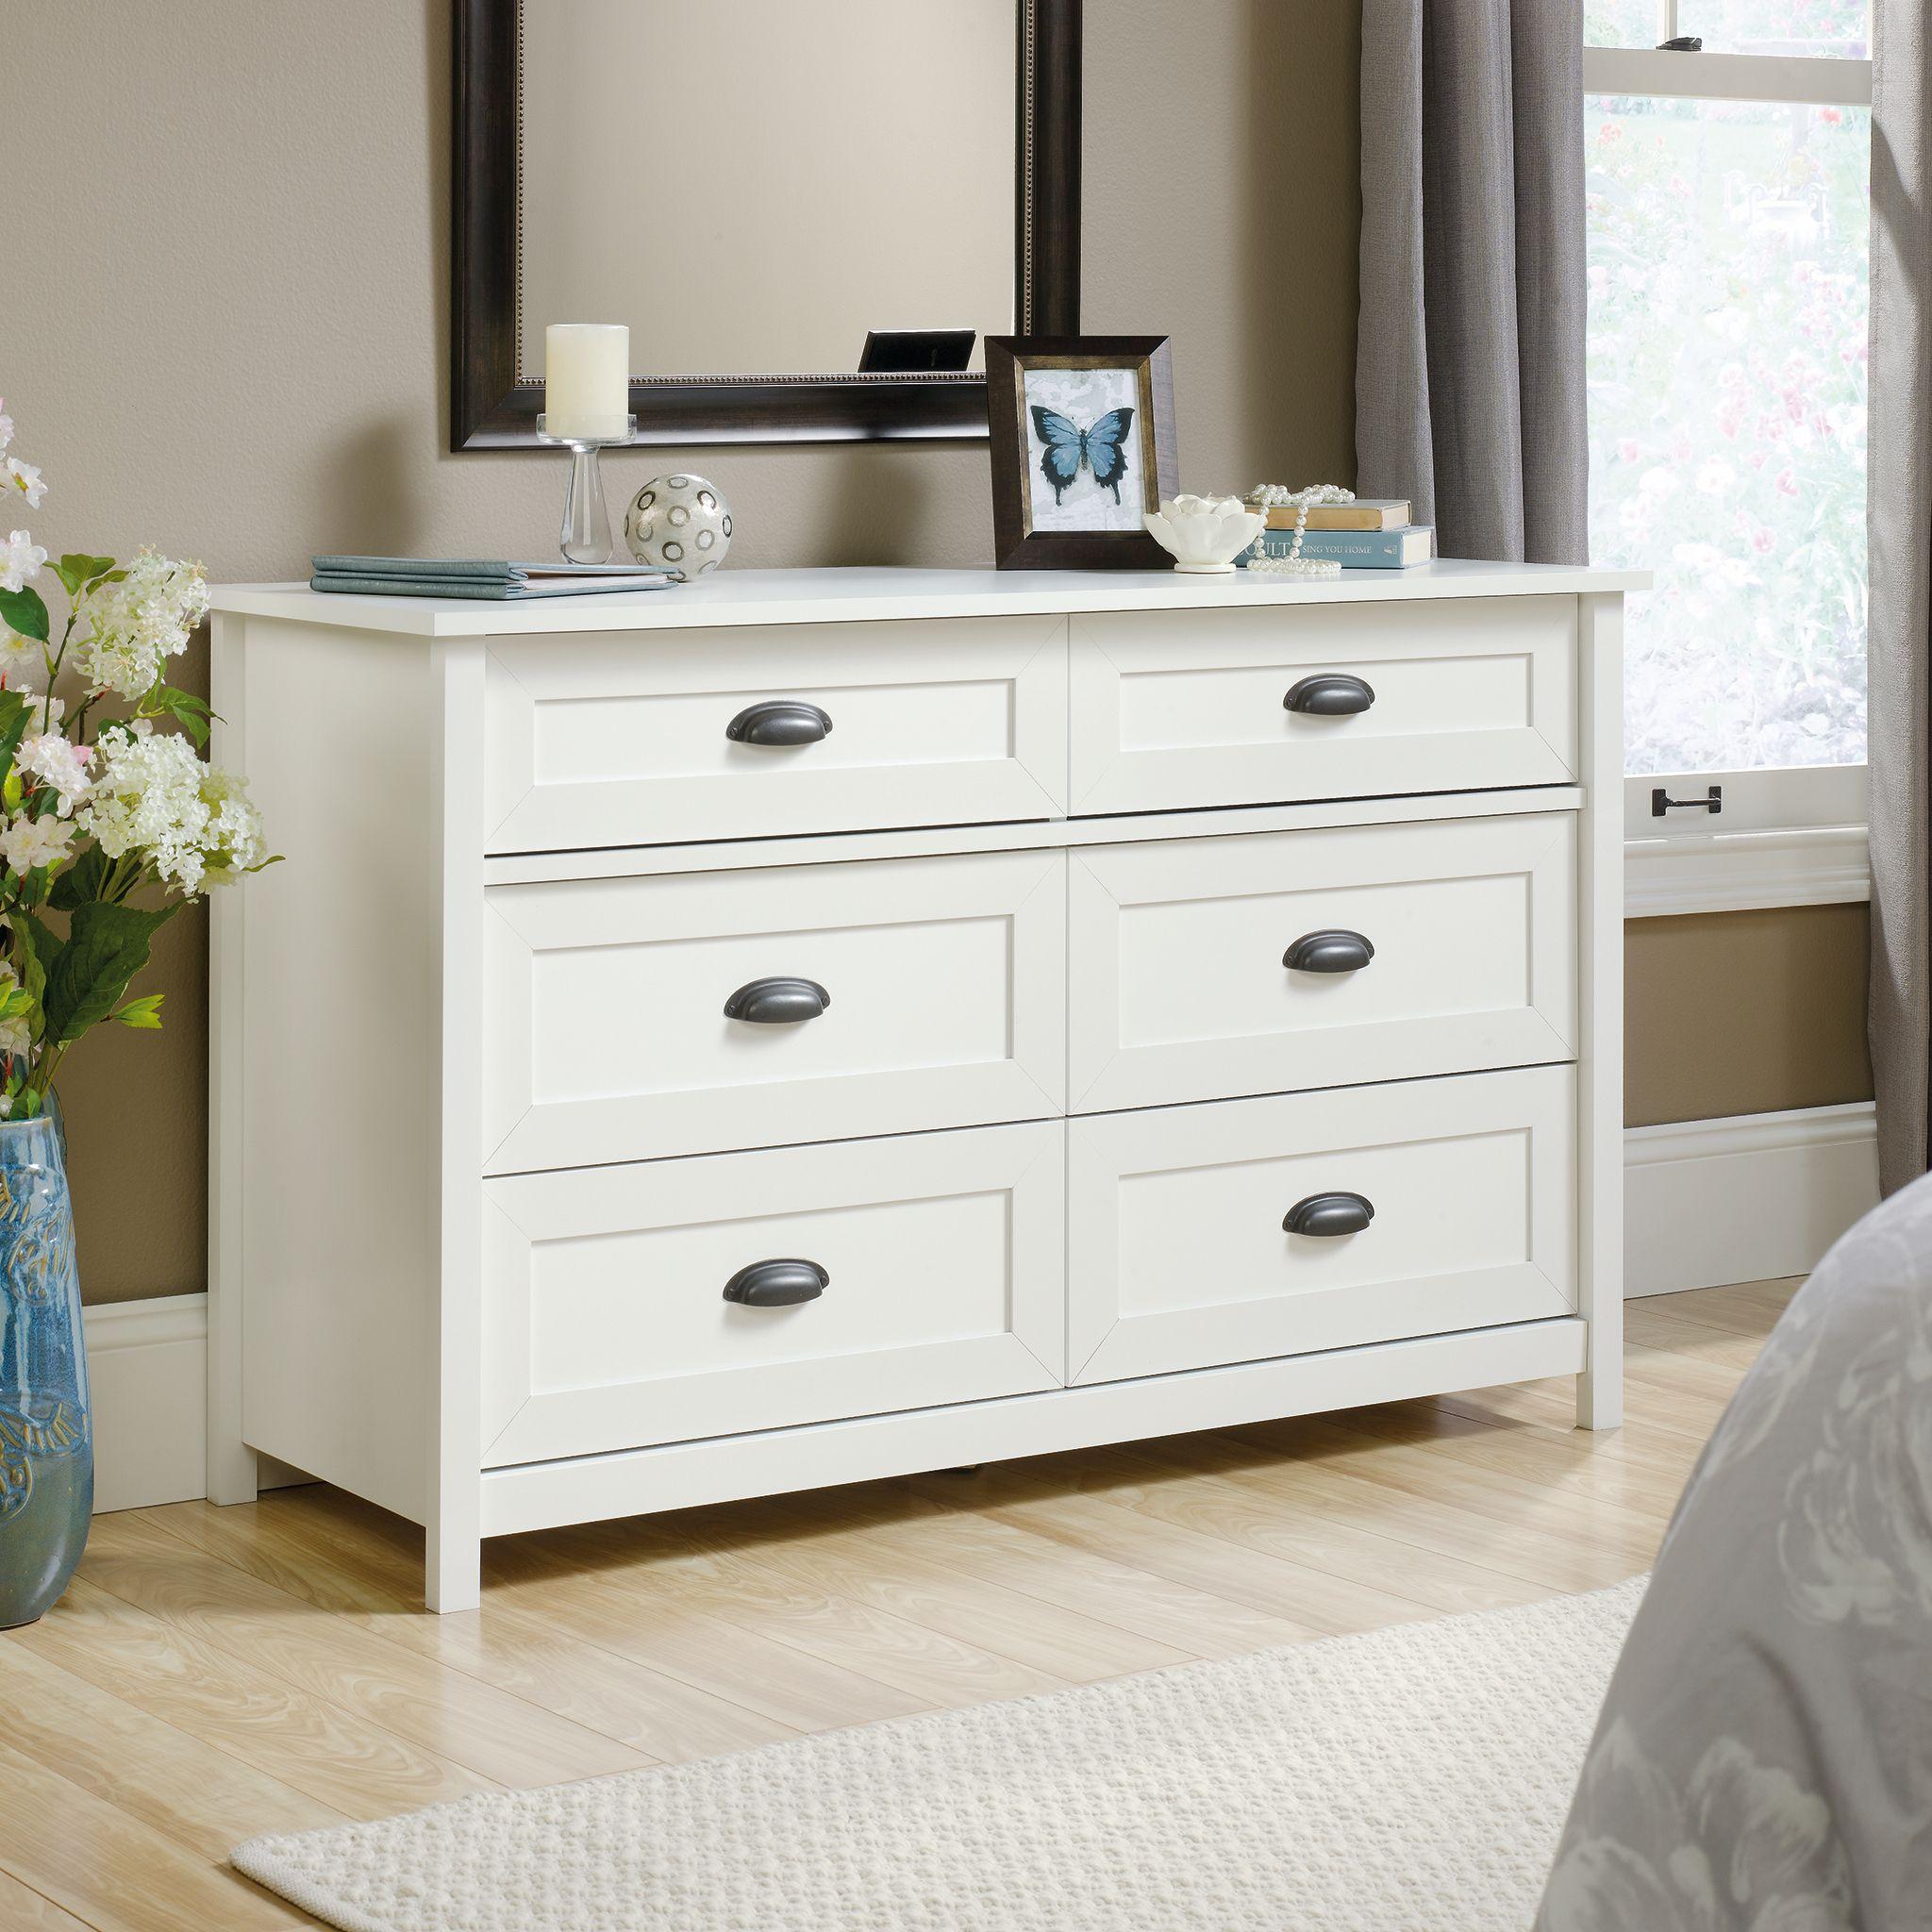 Sauder County Line Dresser, White Dresser drawers